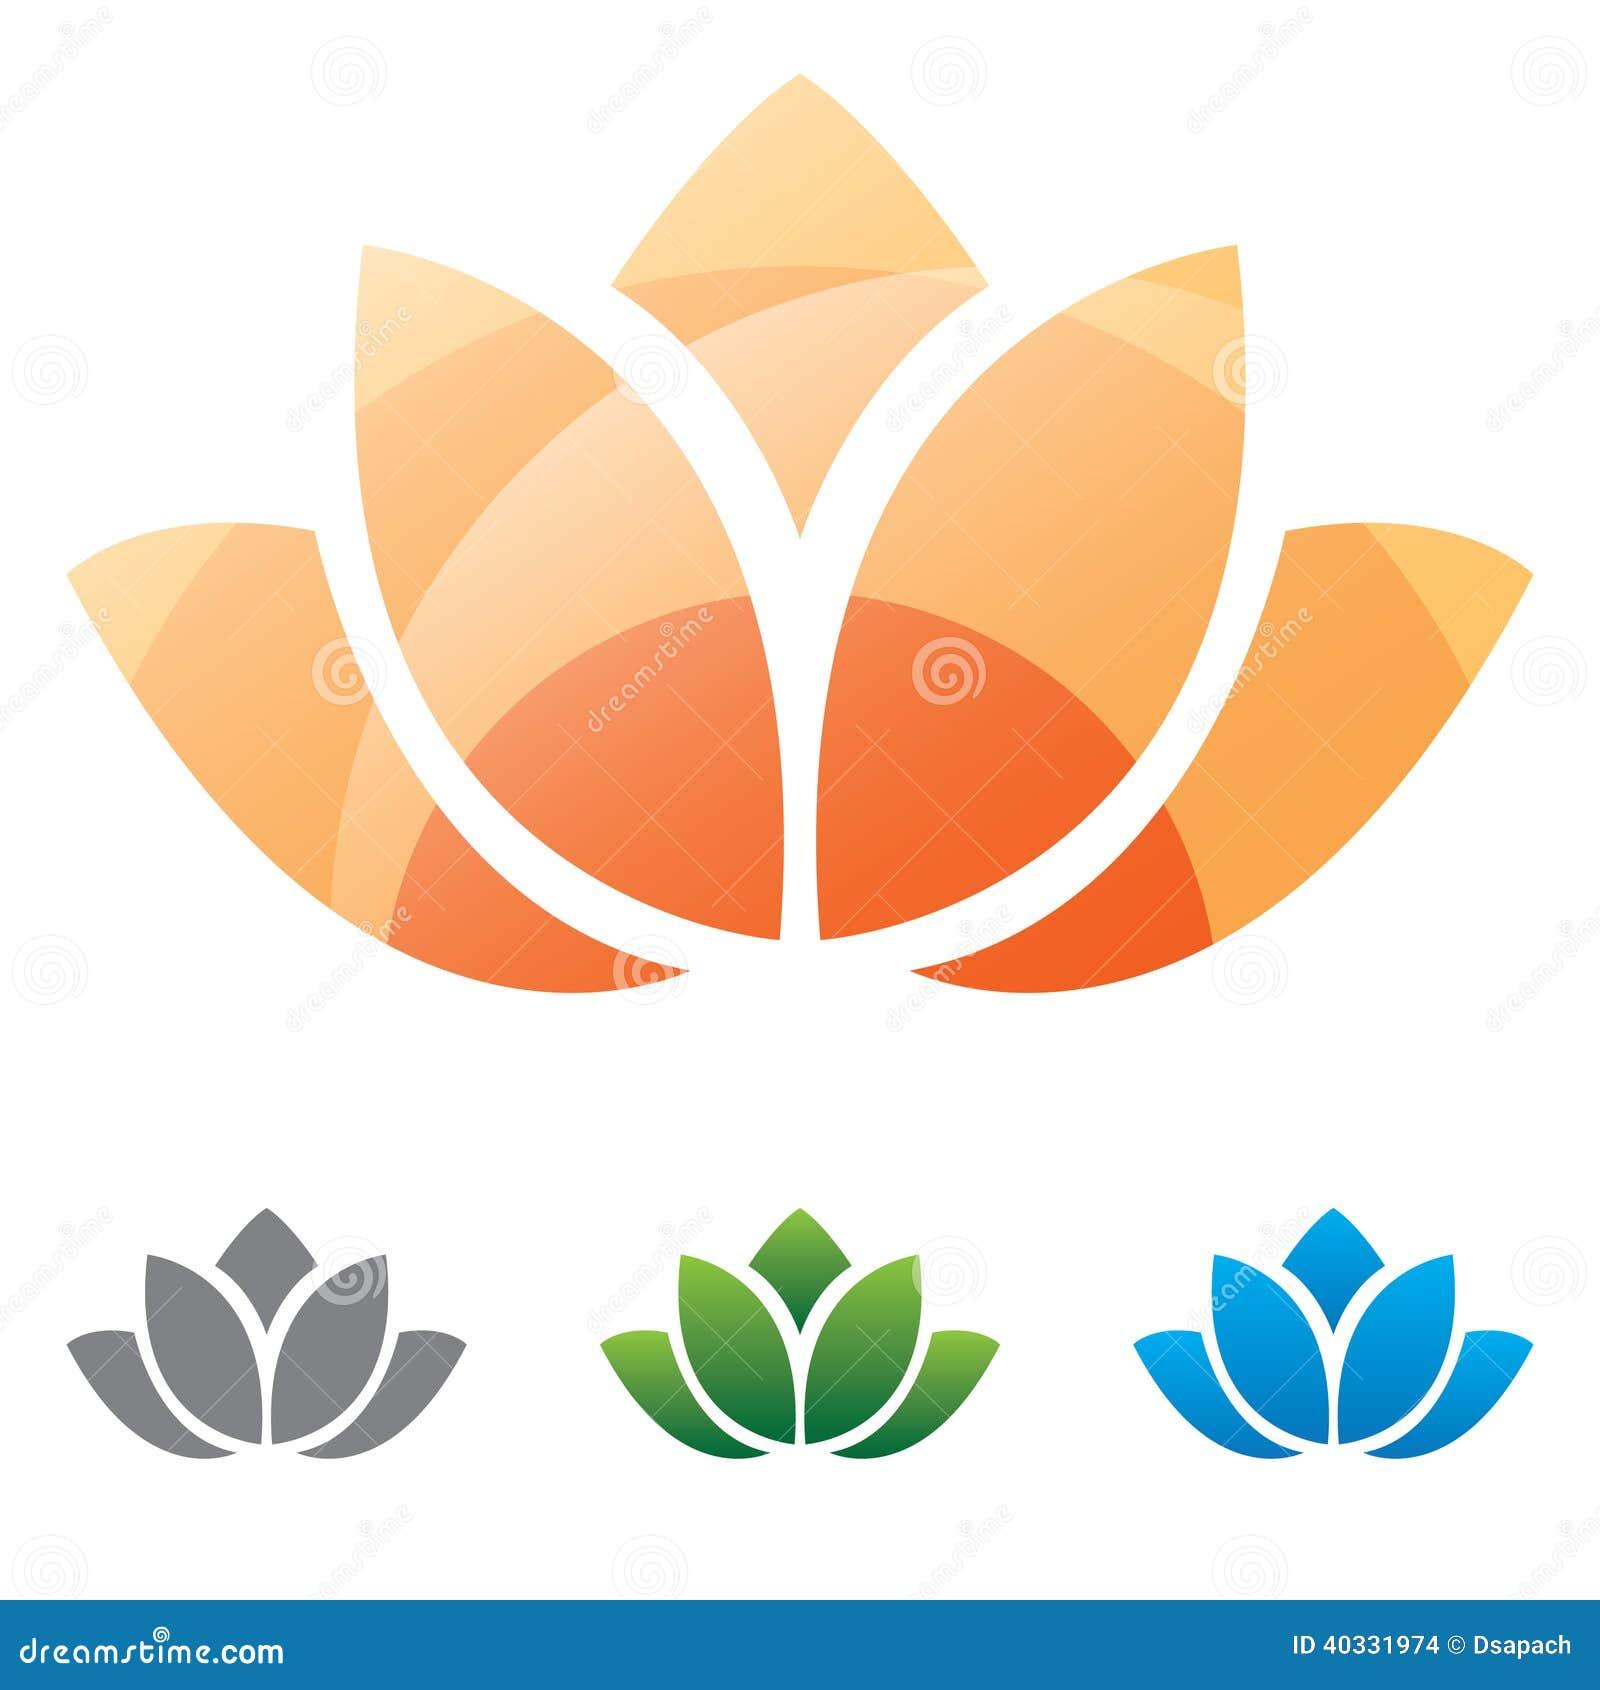 Lotus Flower Silhouette Icon Stock Vector Illustration Of